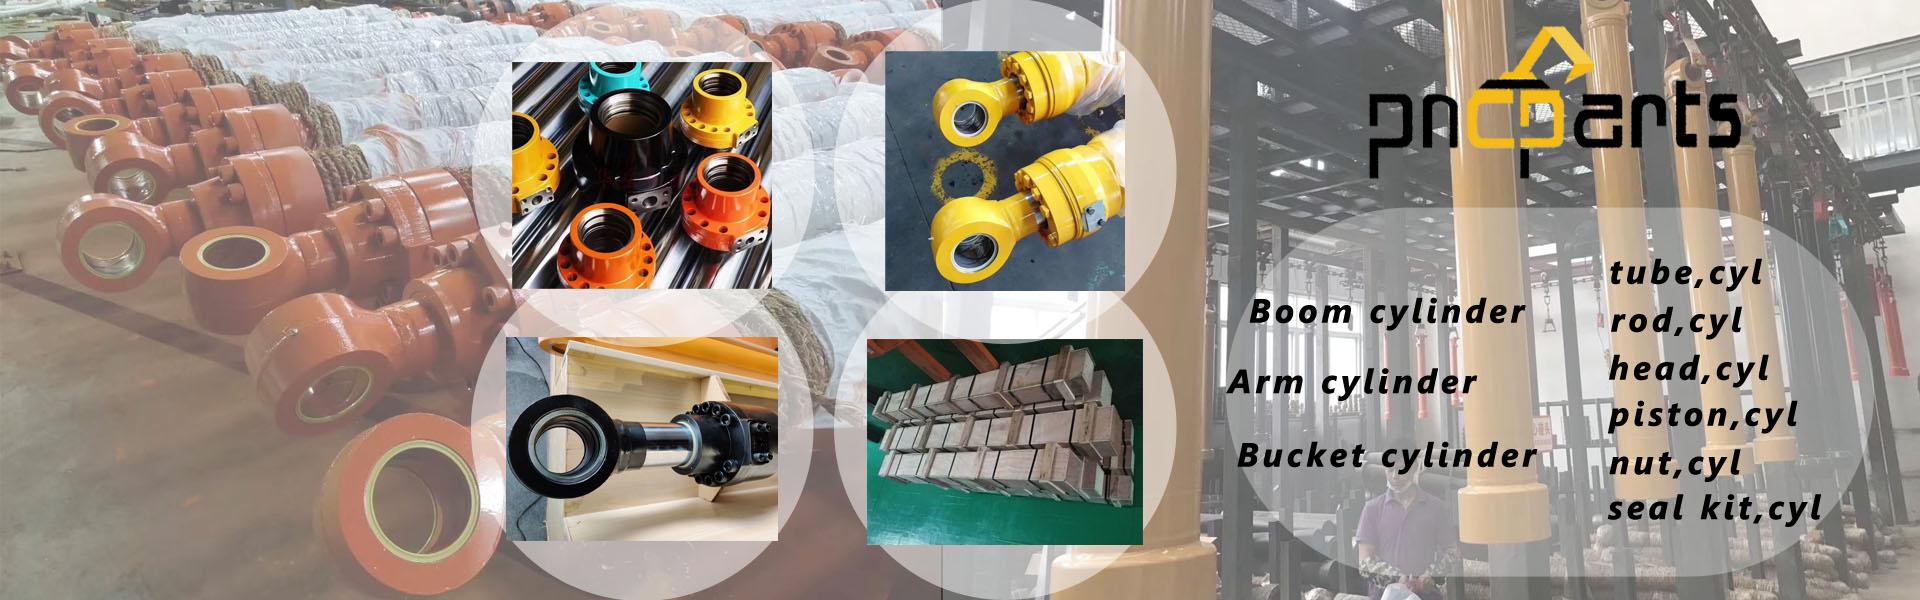 Hydraulic cylindercylinder spare partscylinder seal kit - Home